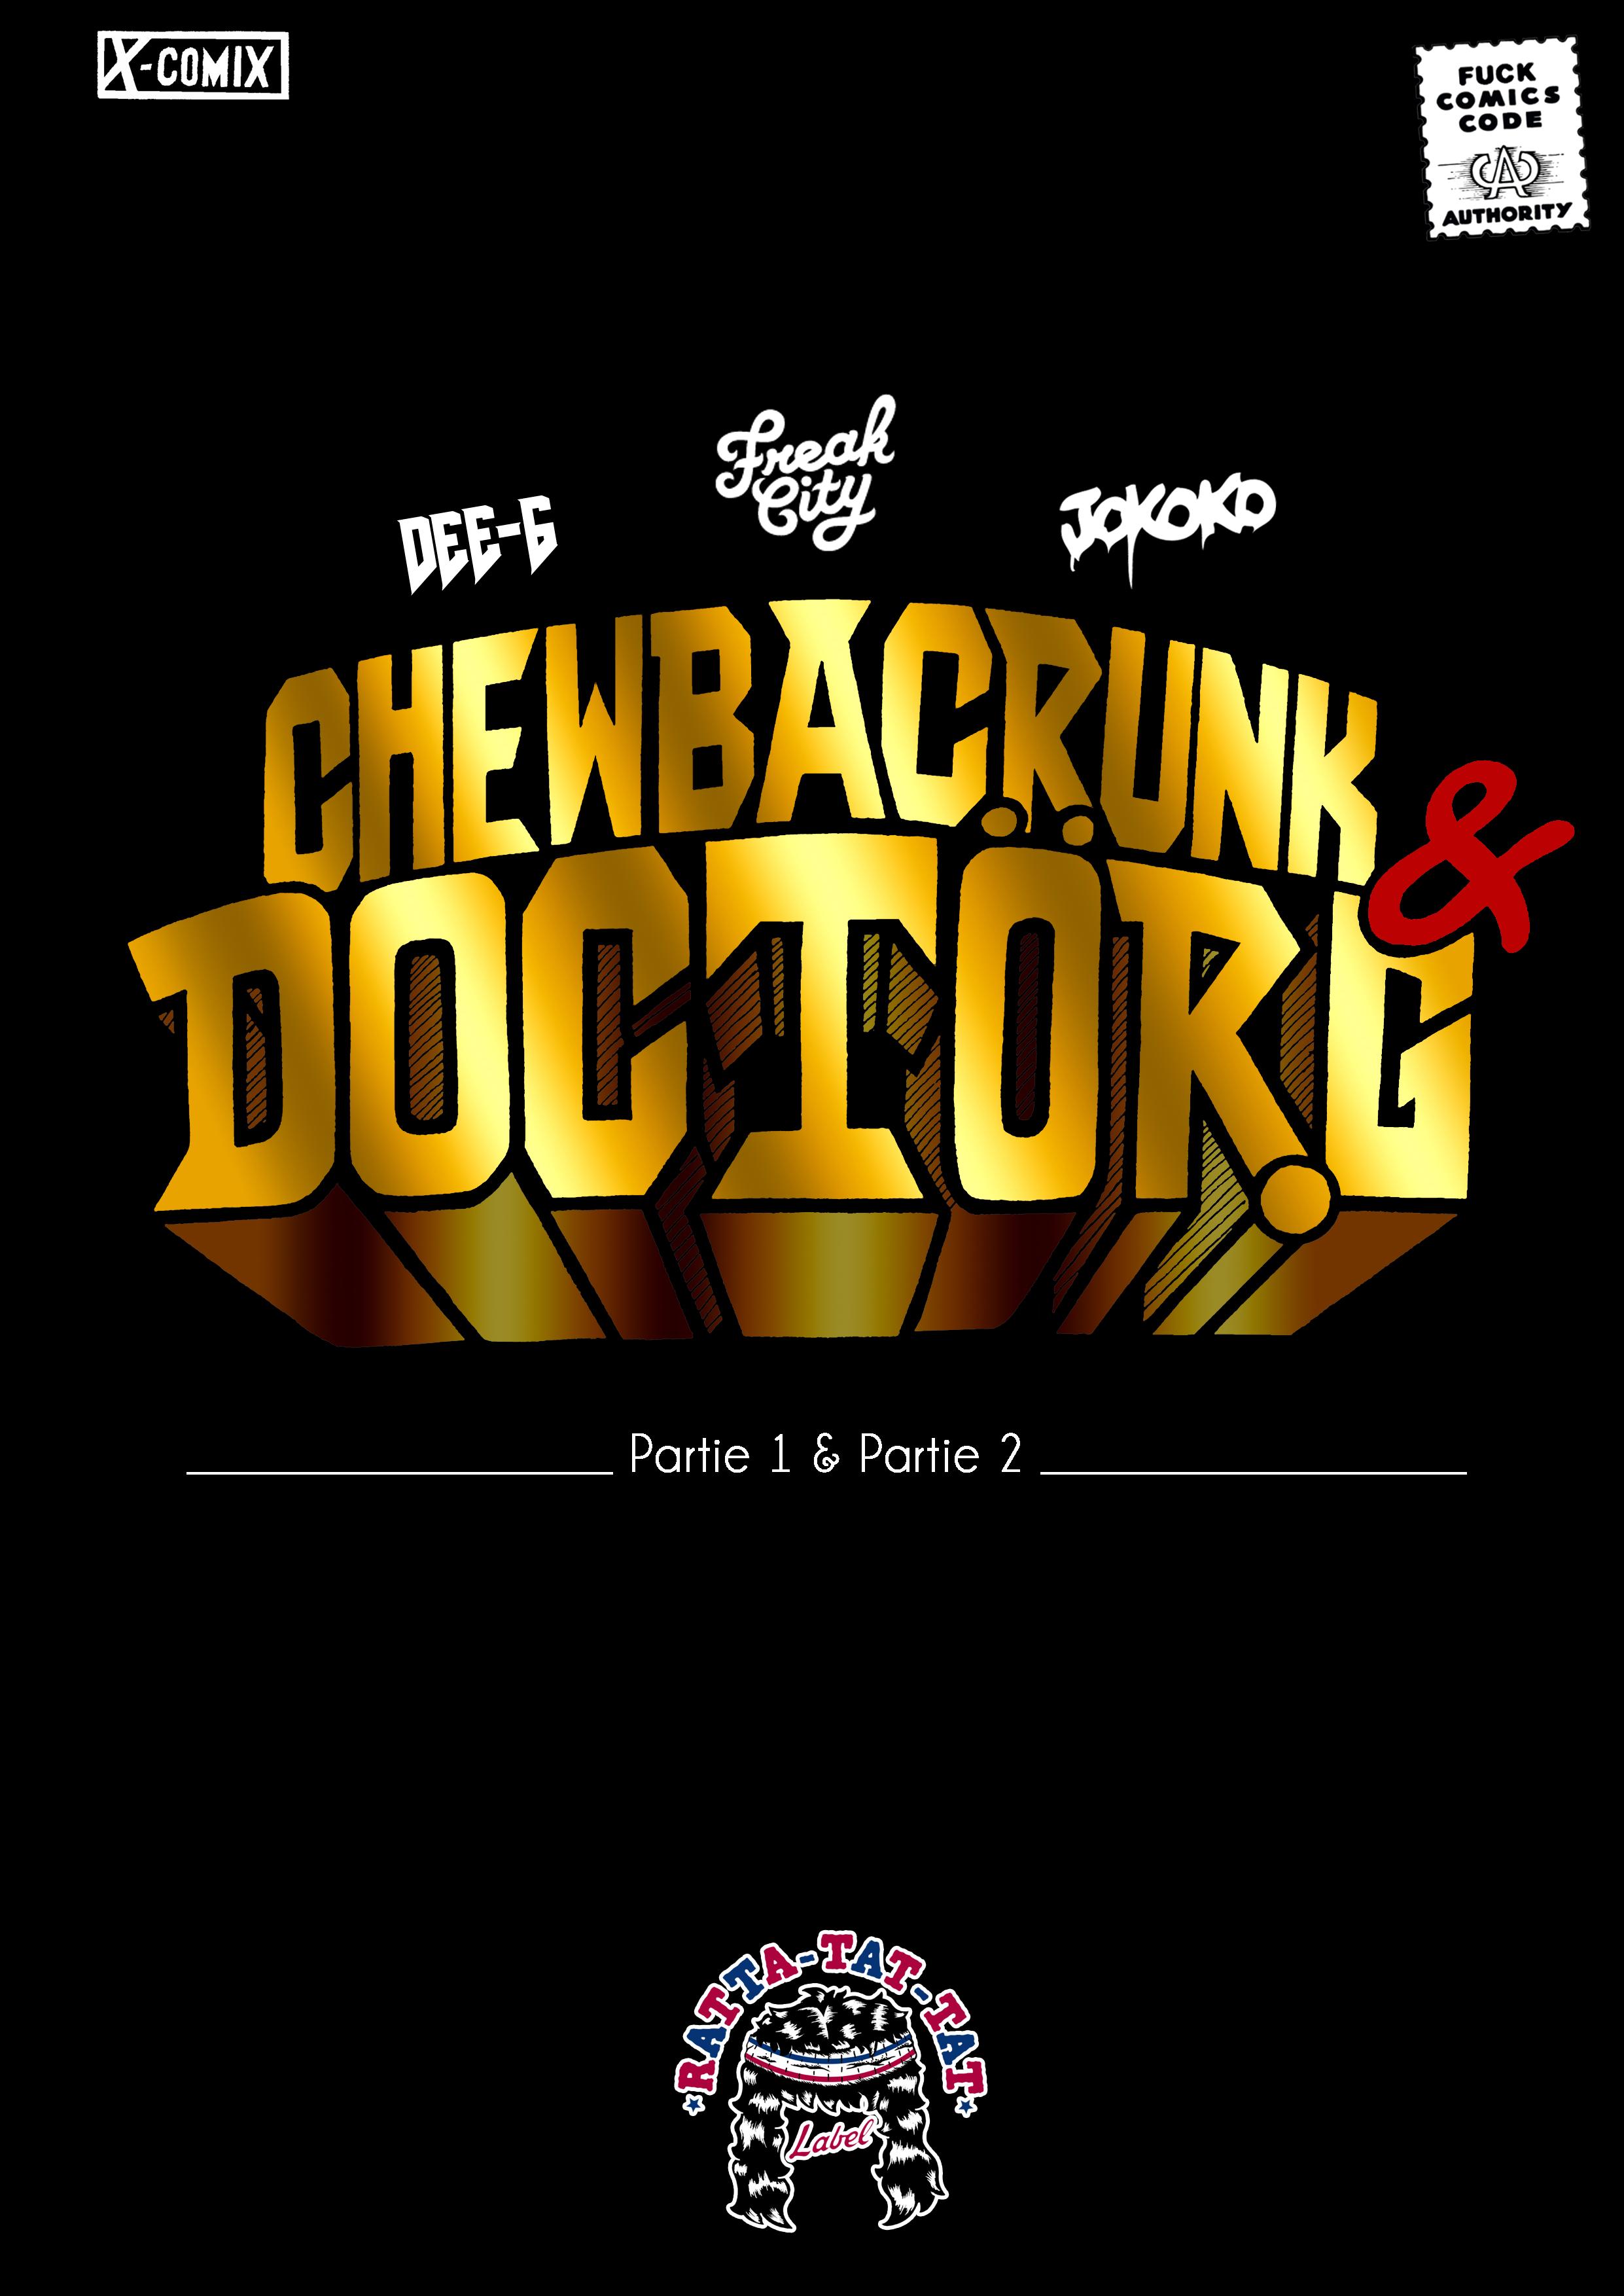 CHEWBACRUNK & DOCTOR G